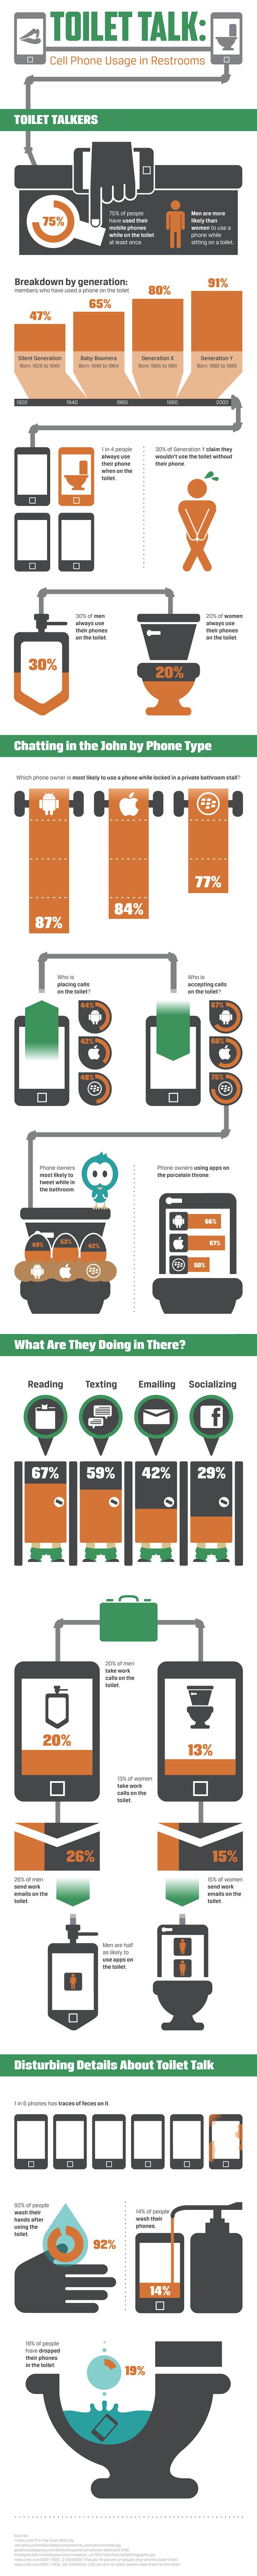 """Toilet Talk"": Android Nutzer auf Klo aktiver"